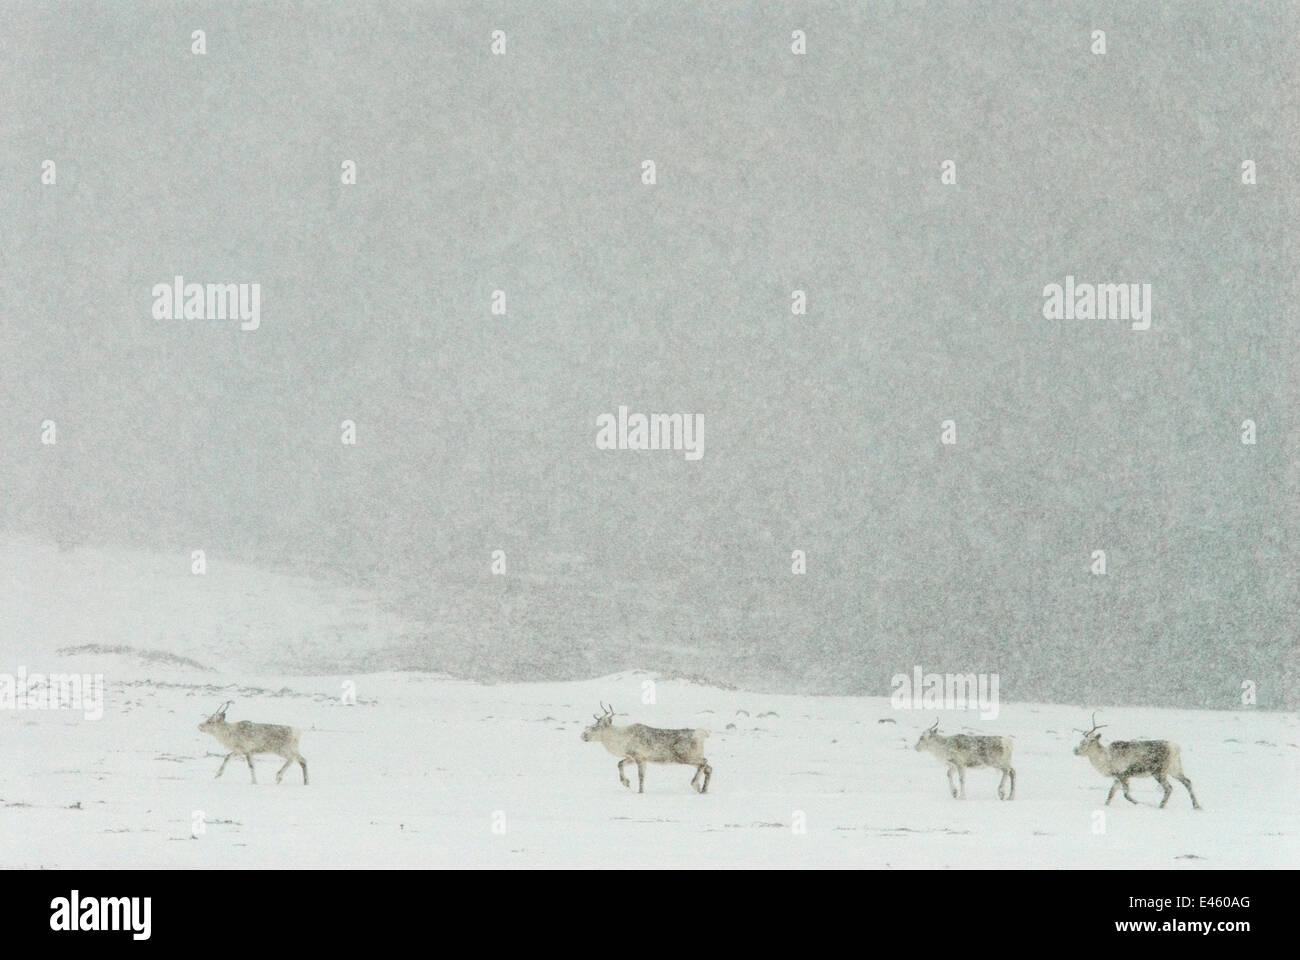 Reindeer (Rangifer tarandus) walking through snowstorm, Vadso, Varanger, Finnmark, Norway, February 2006 Stock Photo